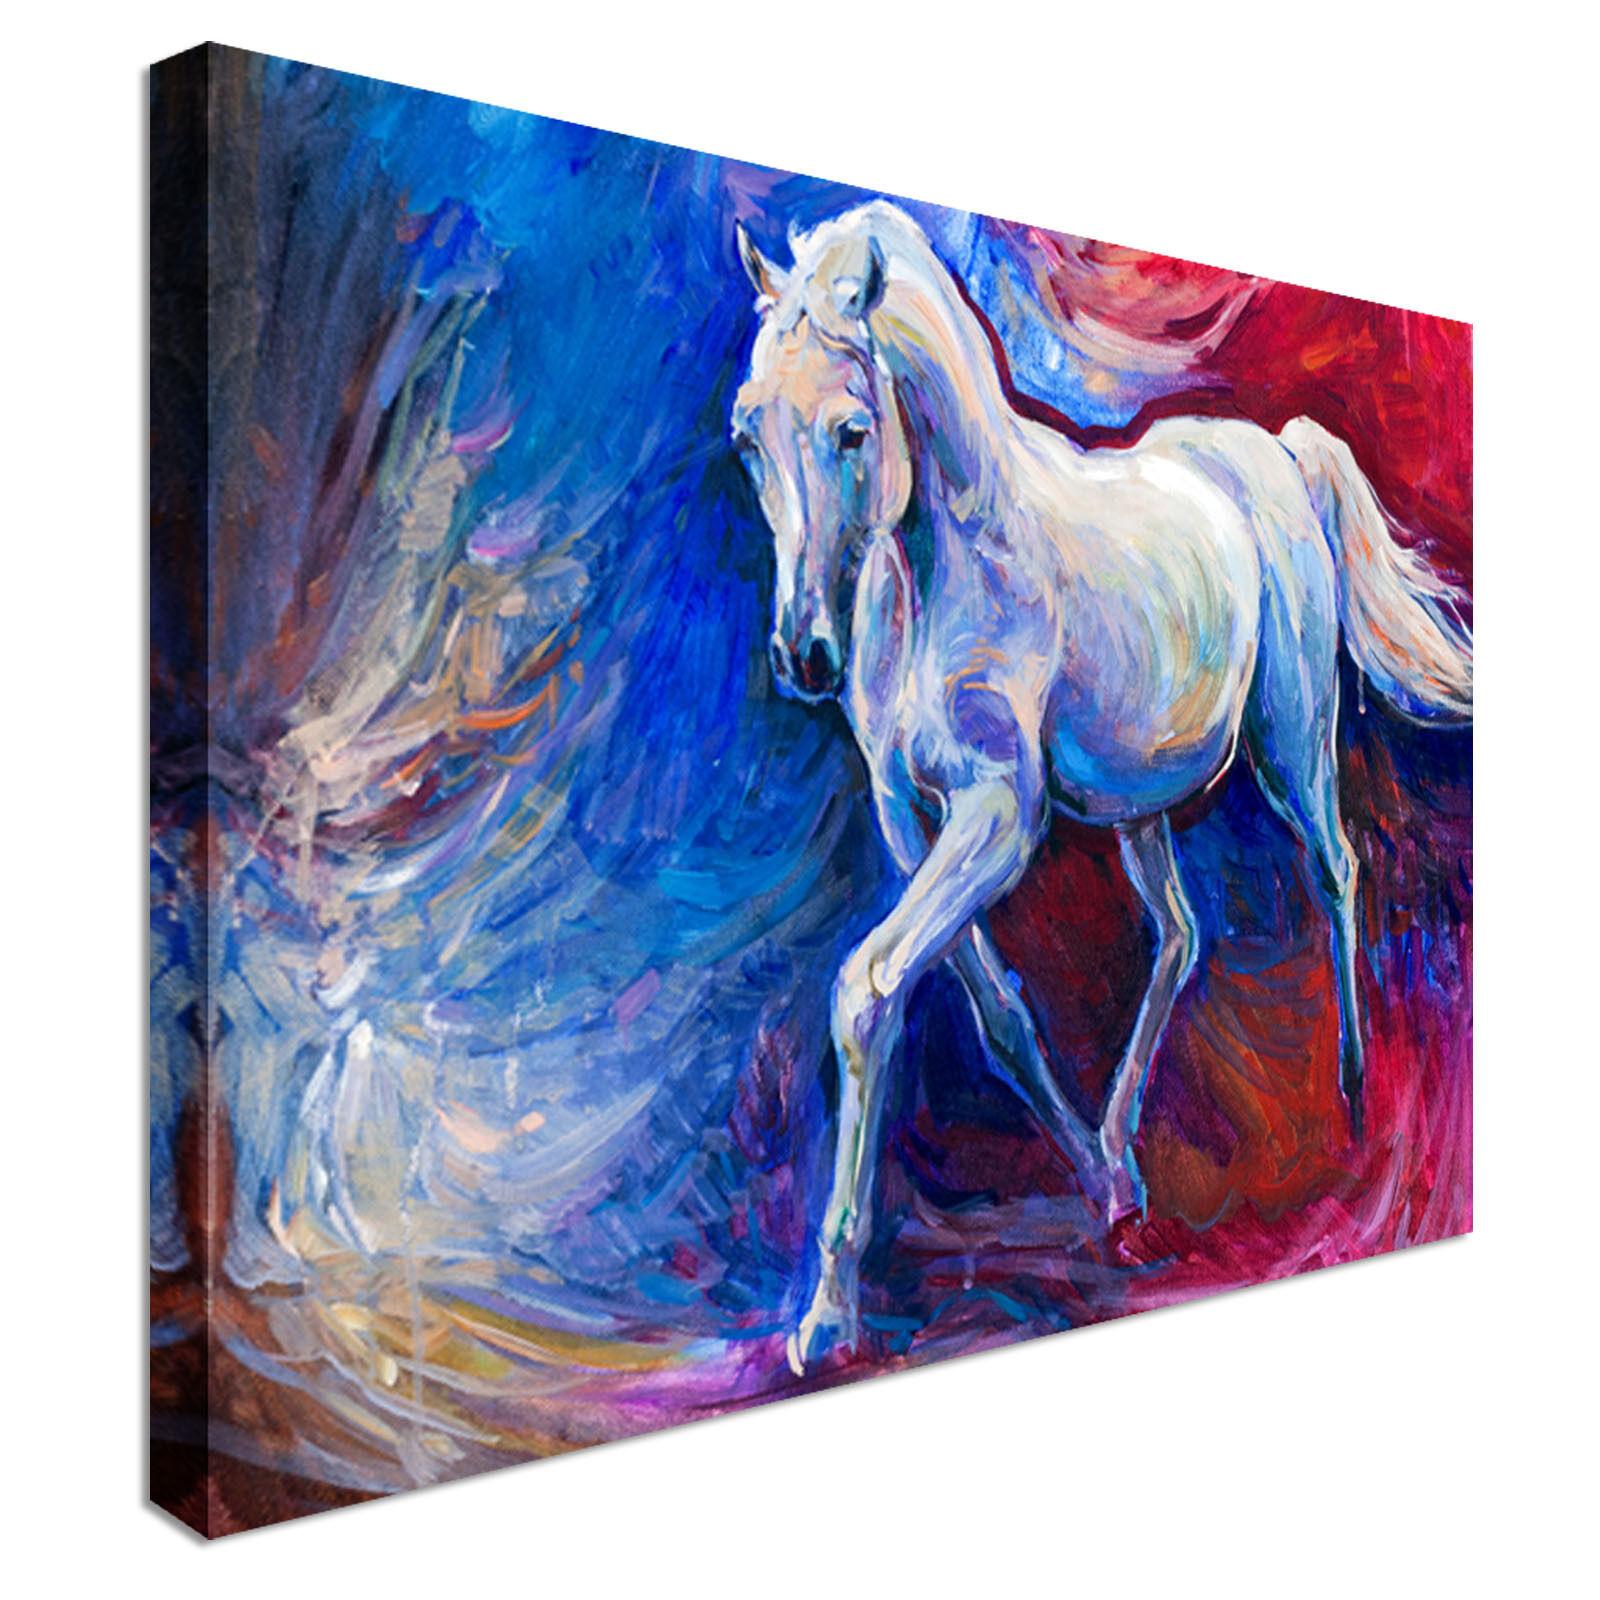 The Running Blau Horse Canvas Wall Art prints high quality